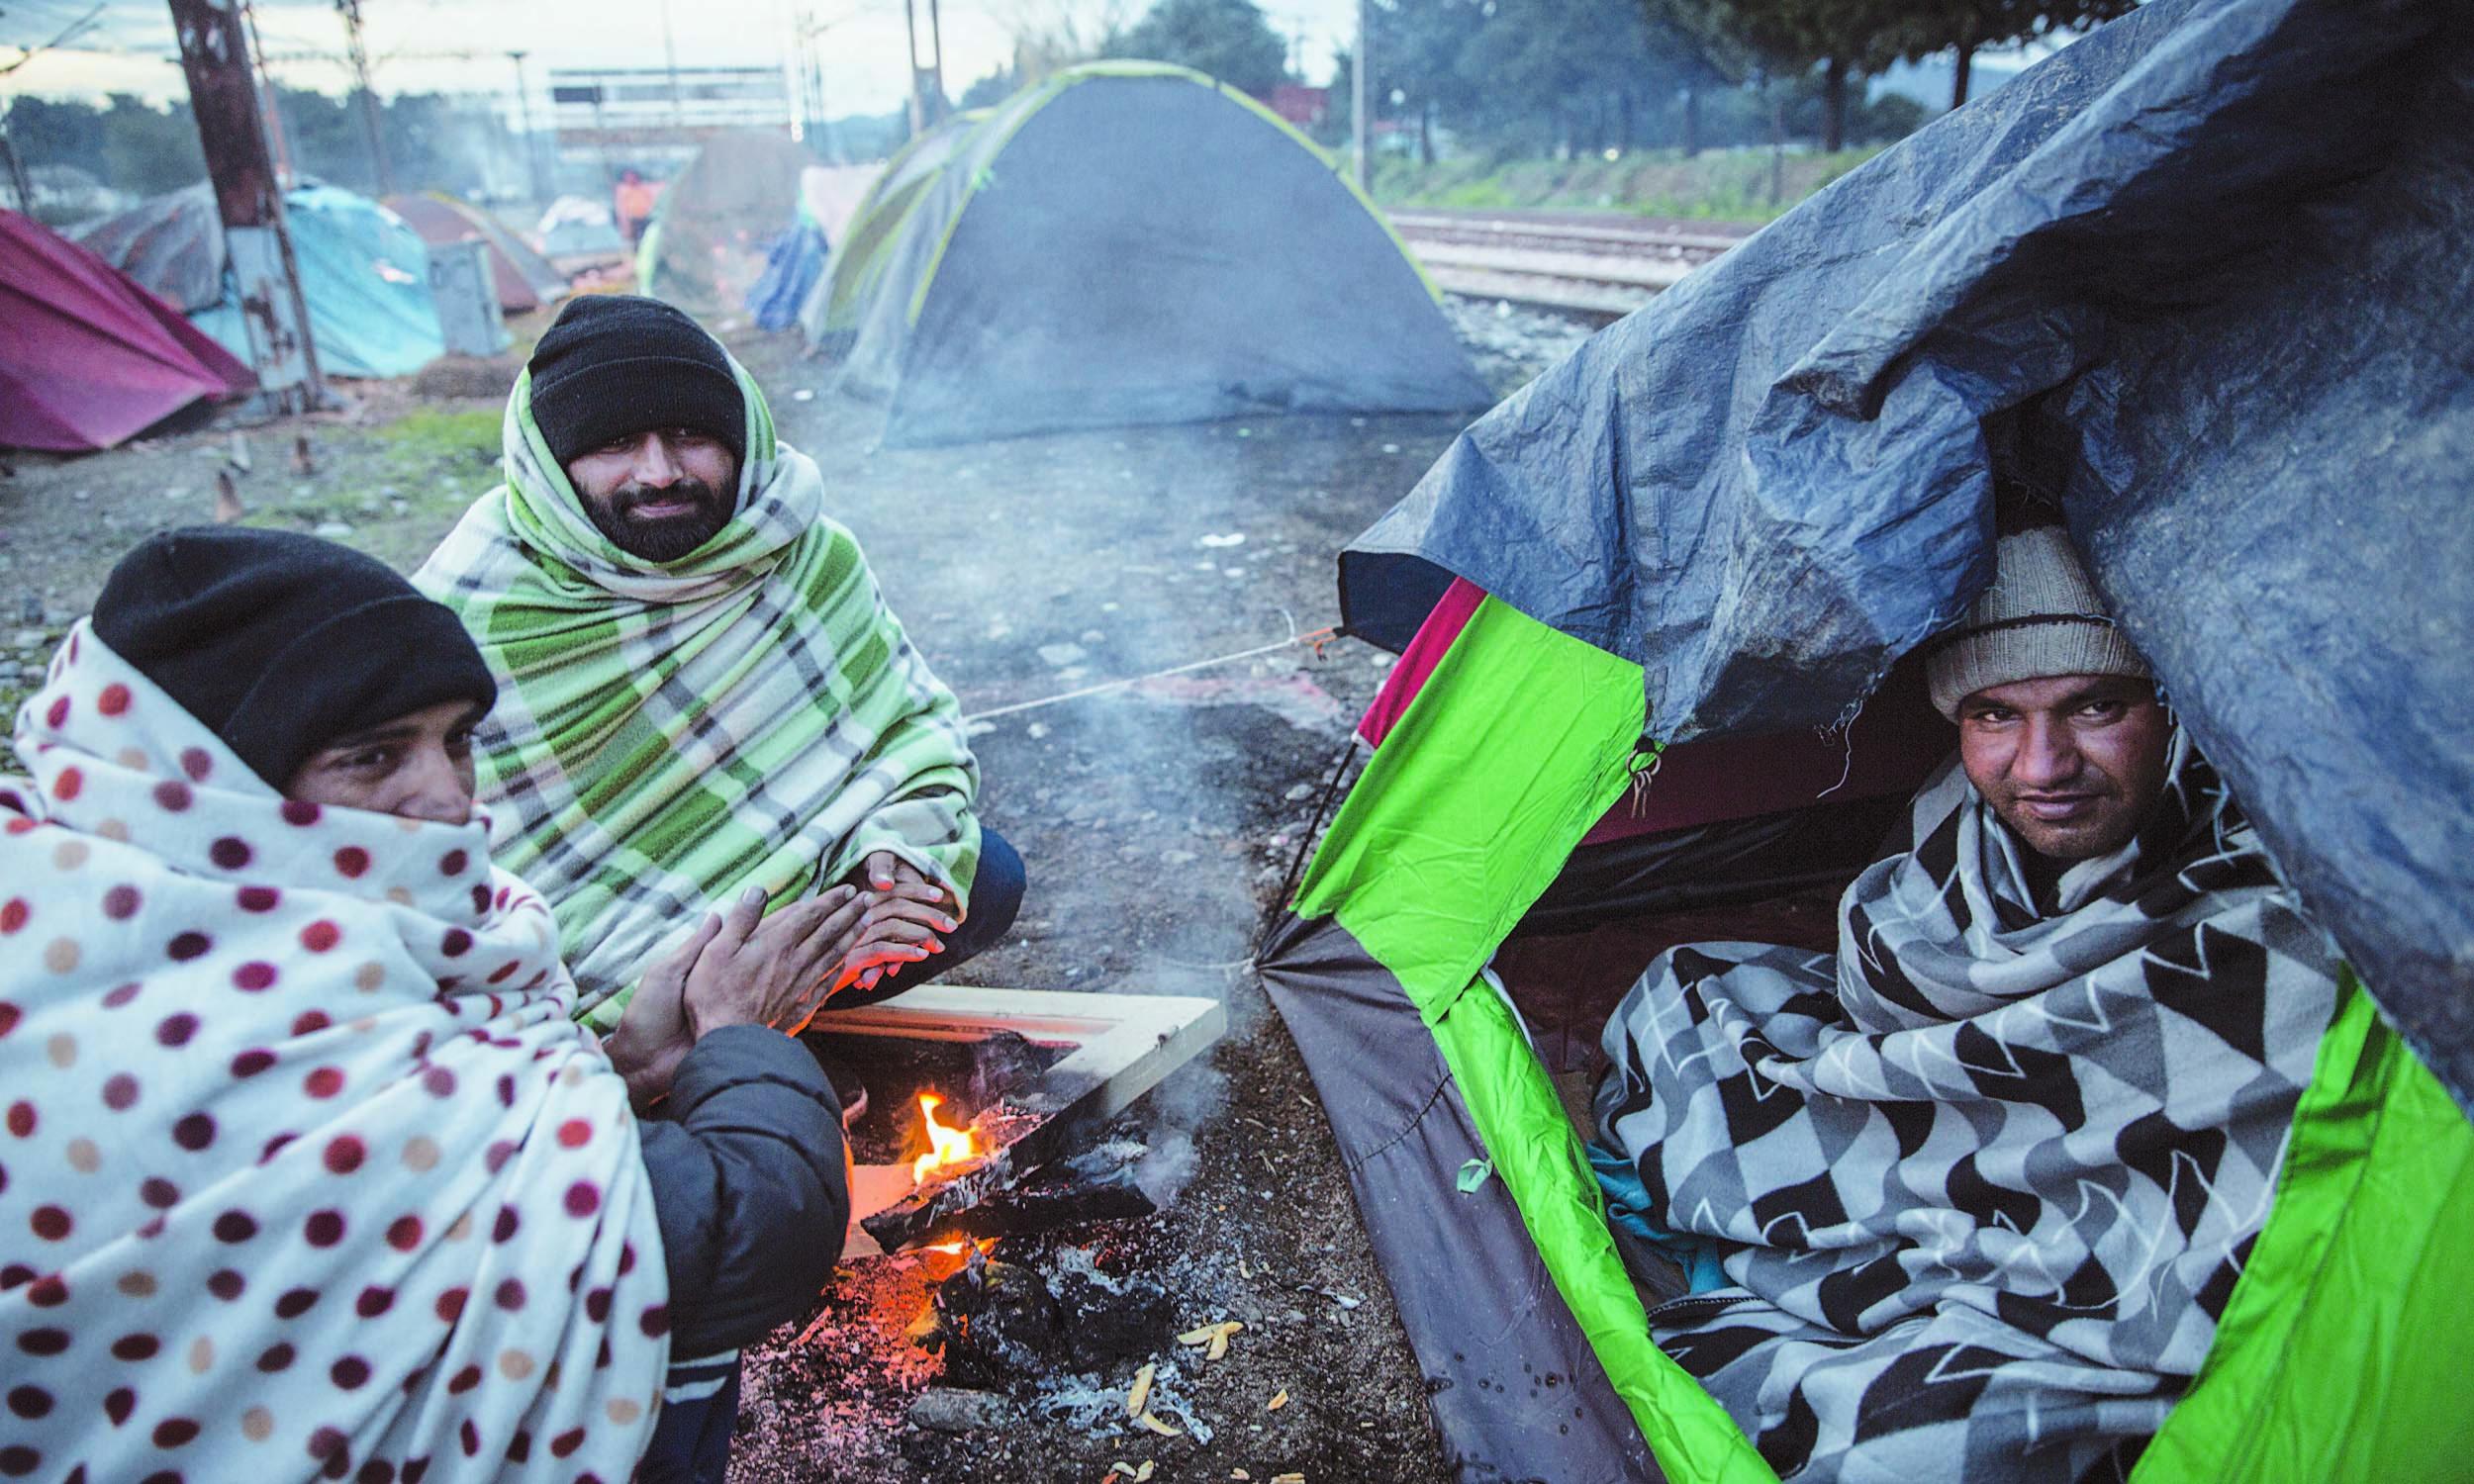 Pakistani migrants sit around a fire at Idomeni camp on a cold morning in November 2015 | Jodi Hilton